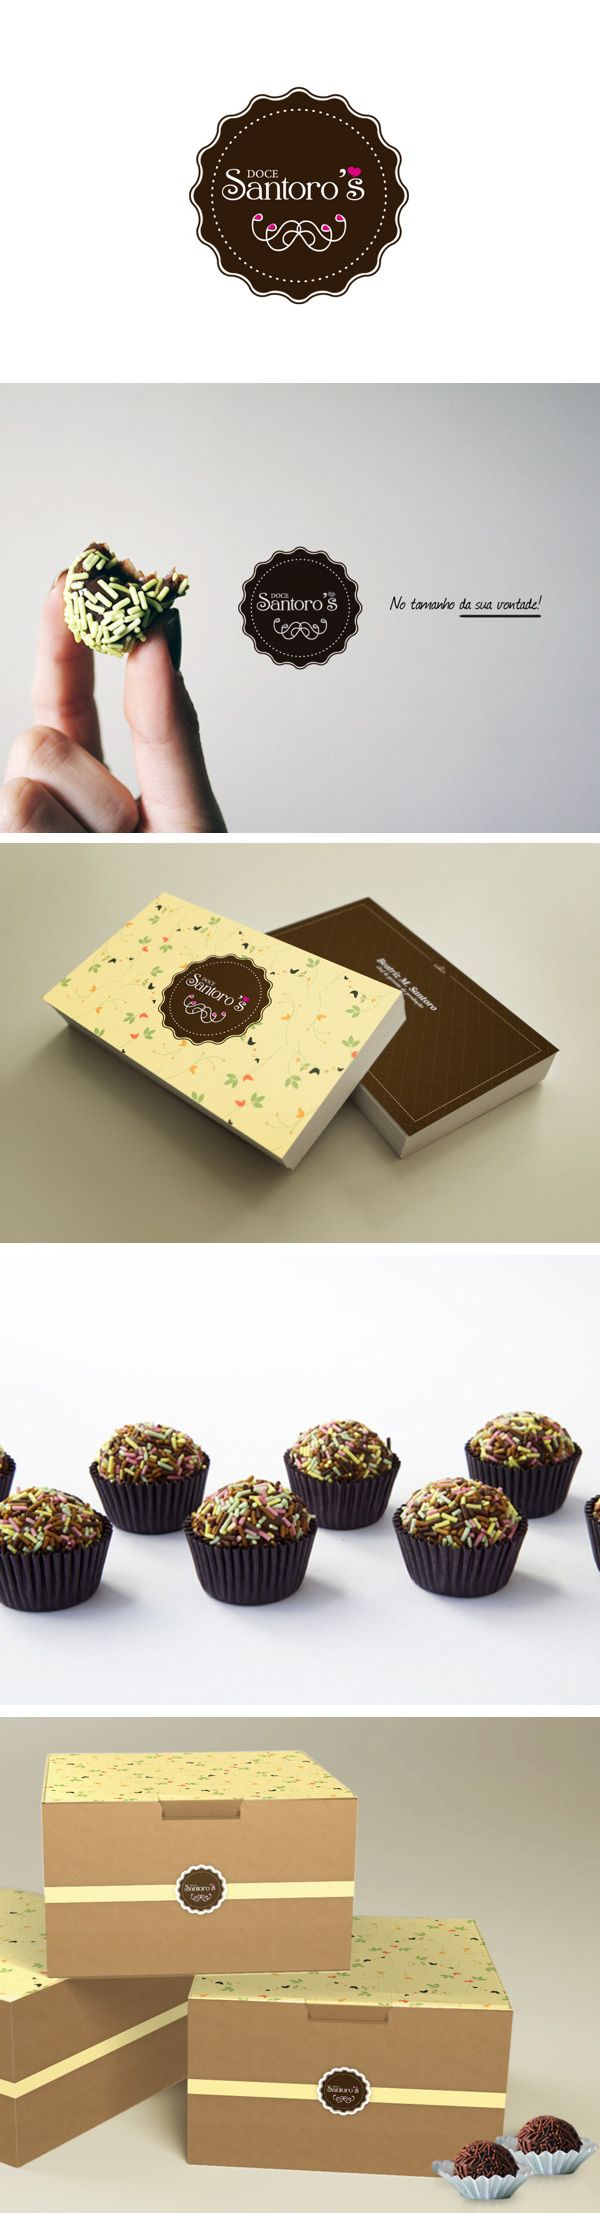 Branding Santoro's doces